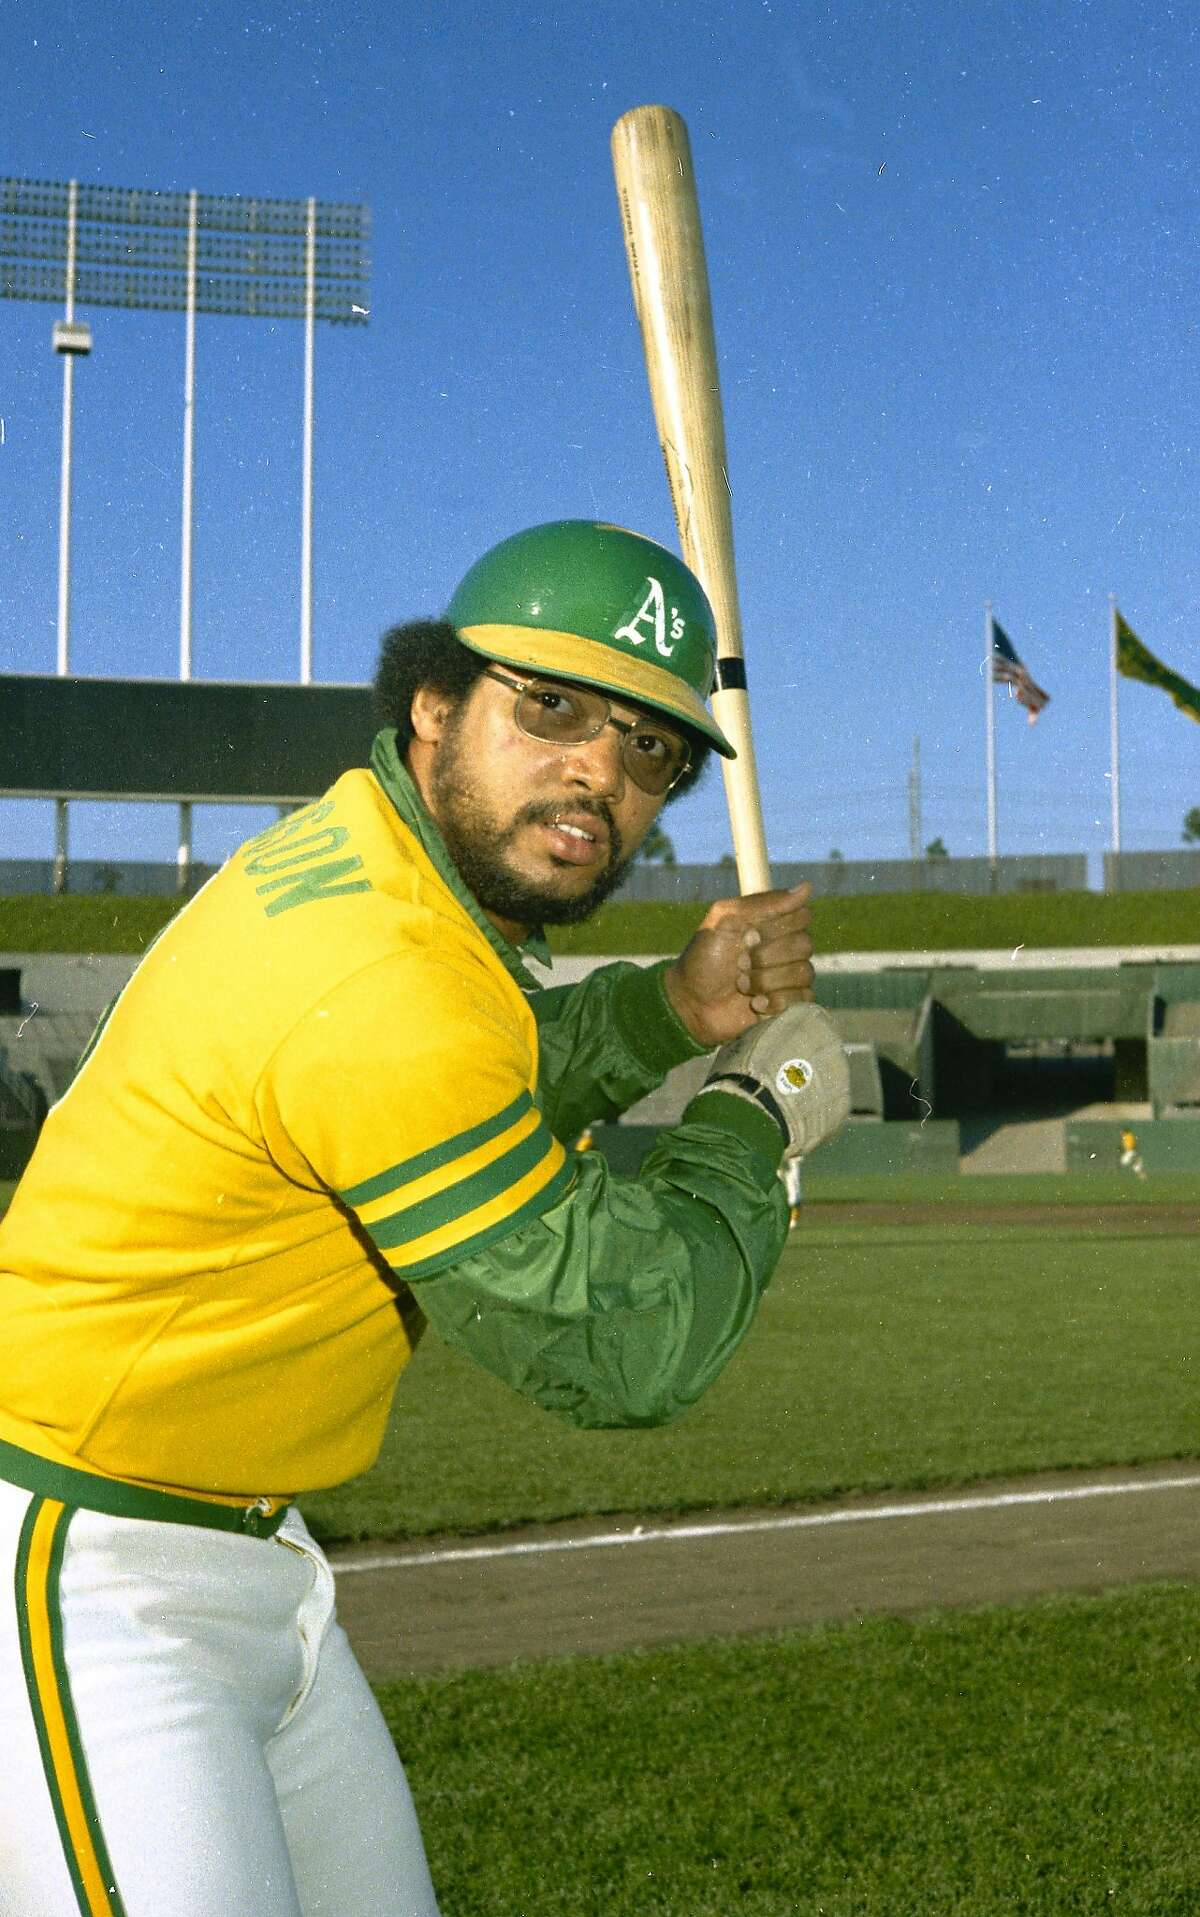 Oakland A's star player Reggie Jackson is seen, 1973. (AP Photo)